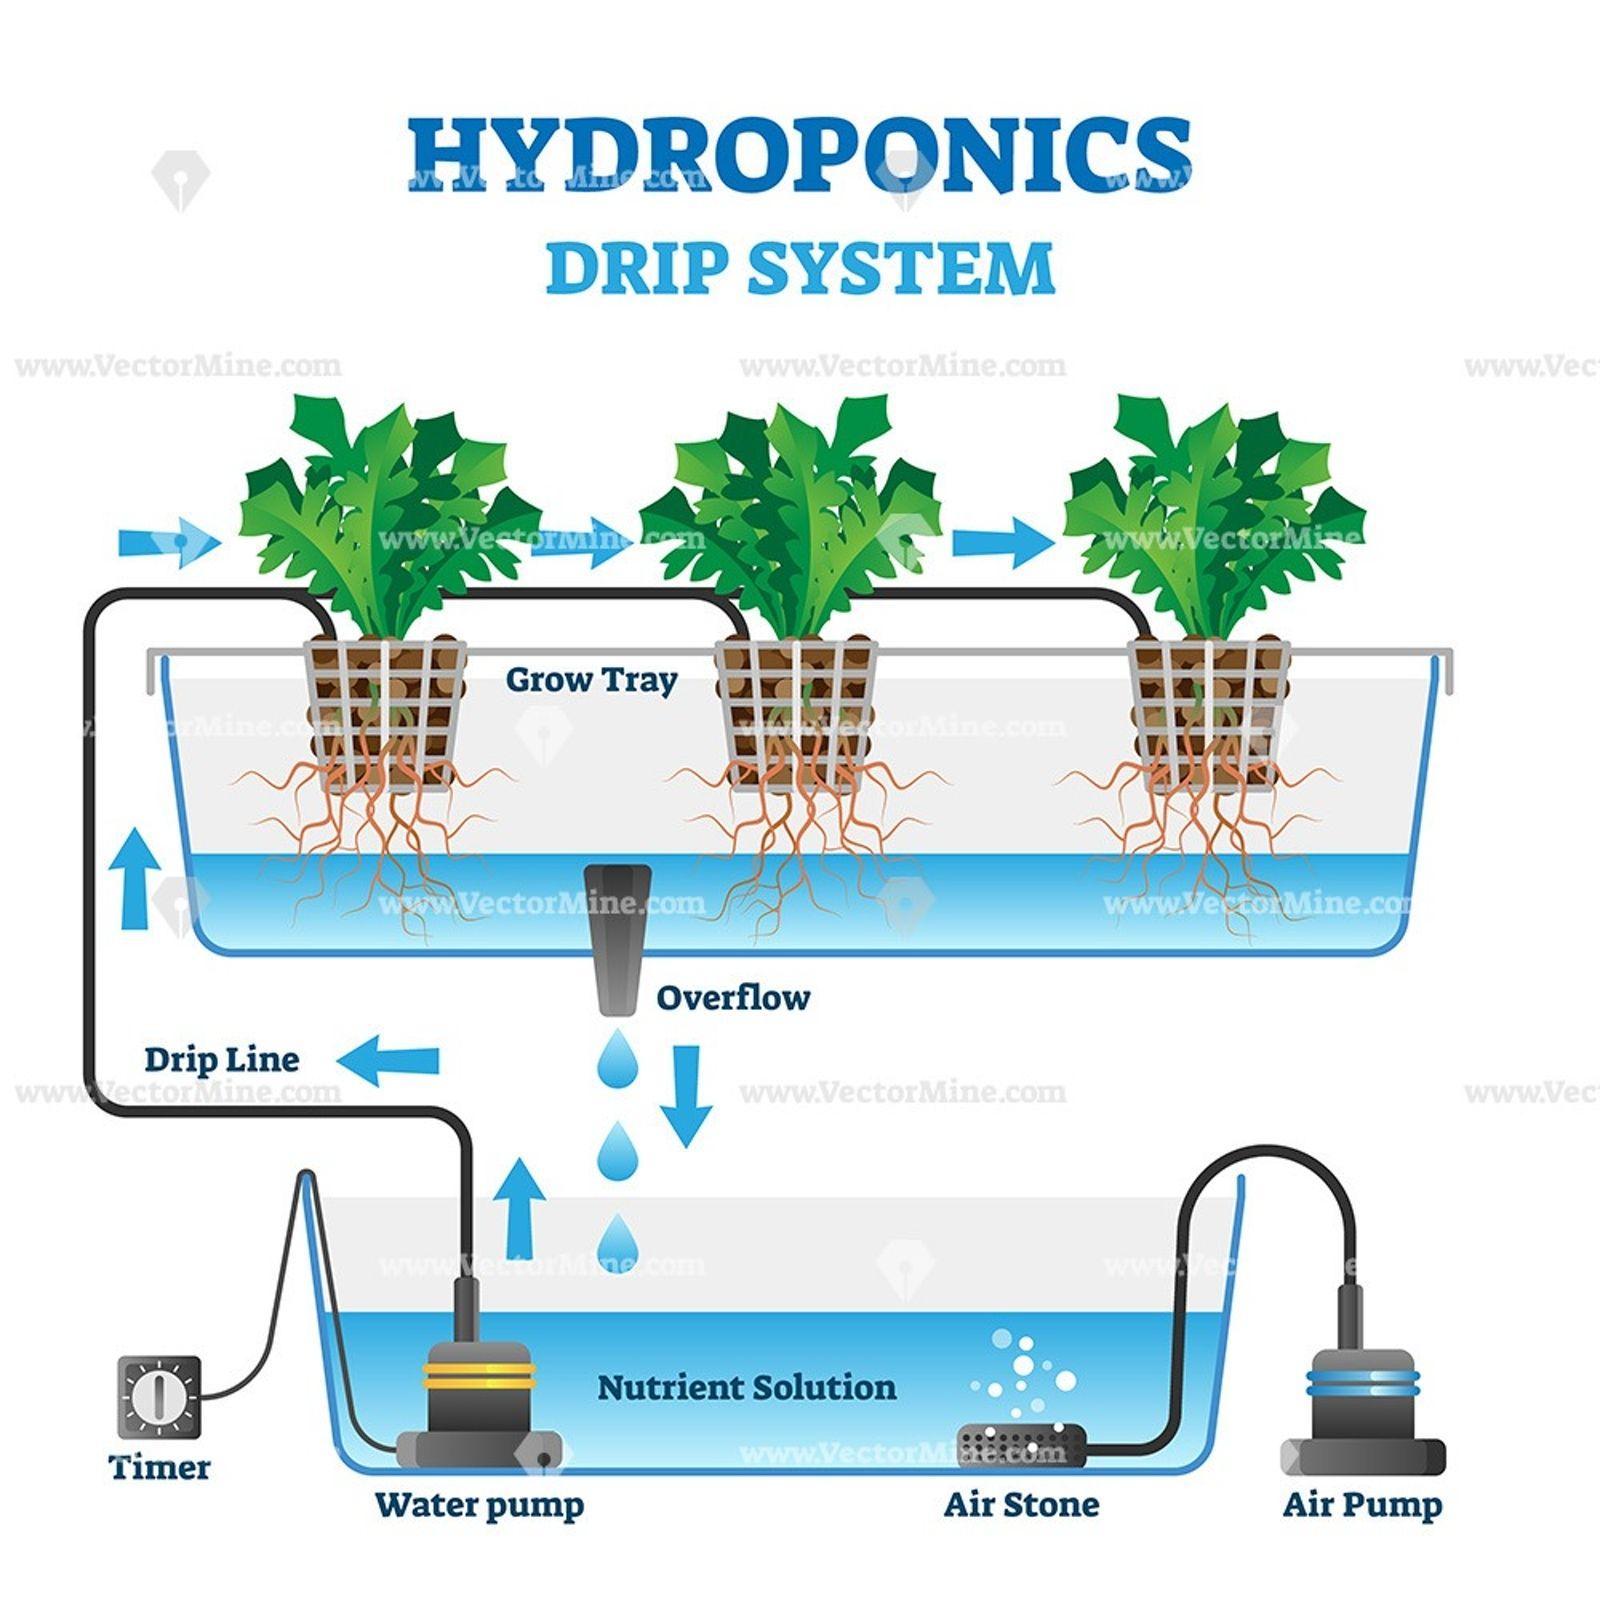 Hydroponics Vector Illustration In